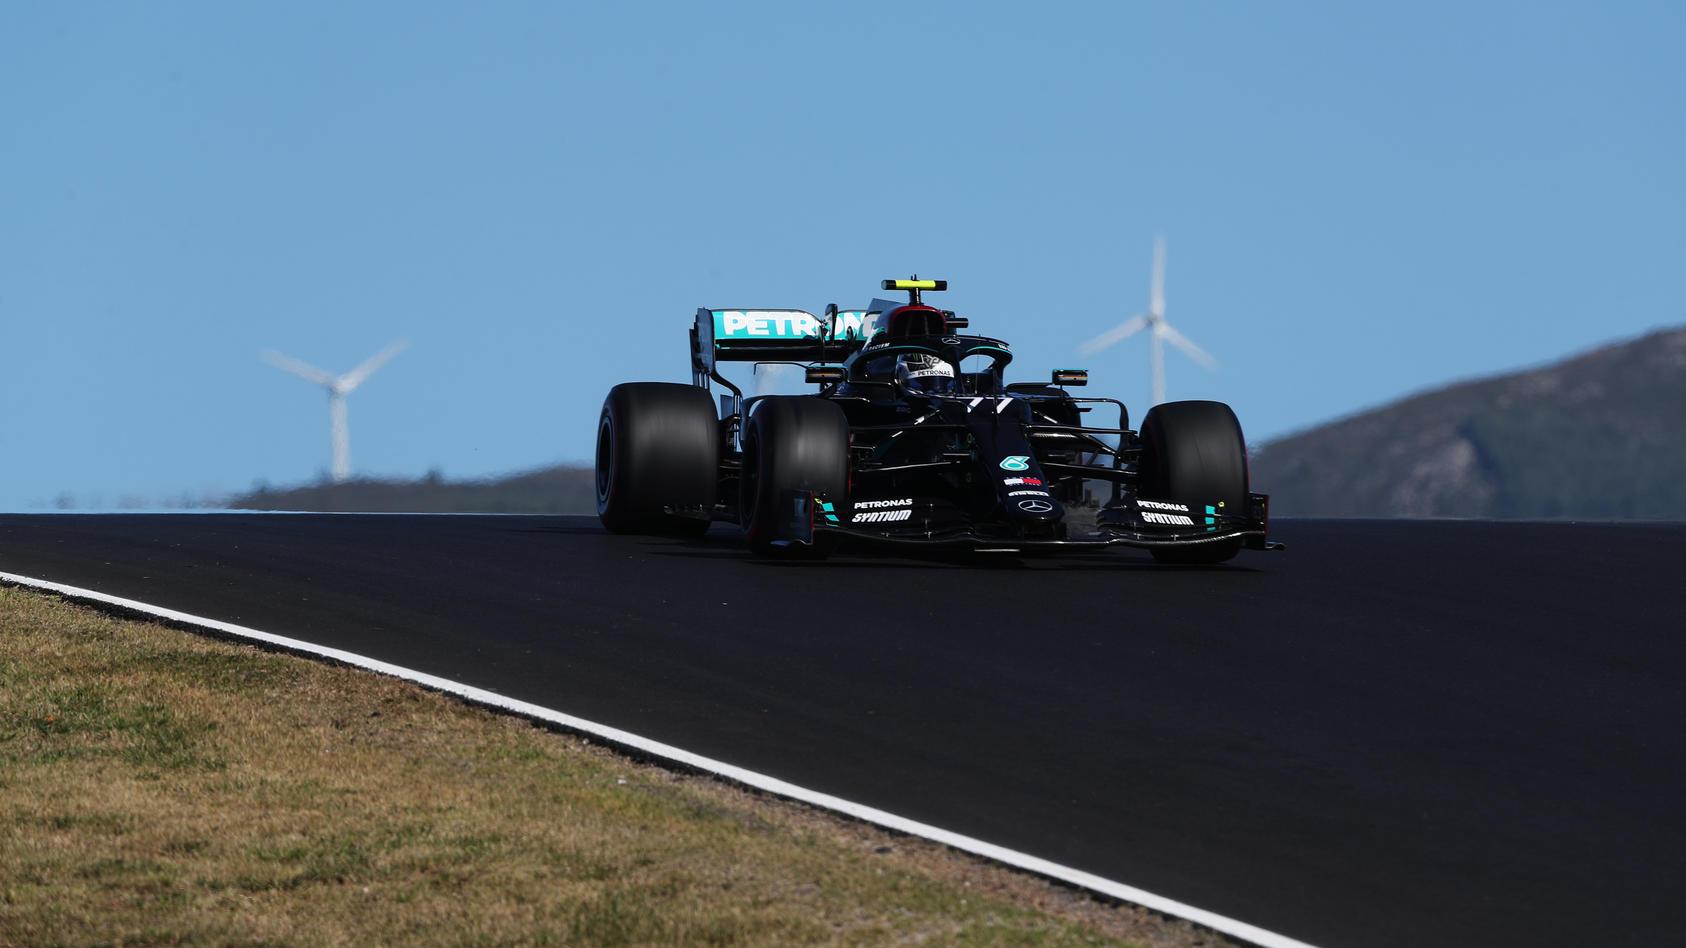 F1 Grand Prix of Portugal - Final Practice